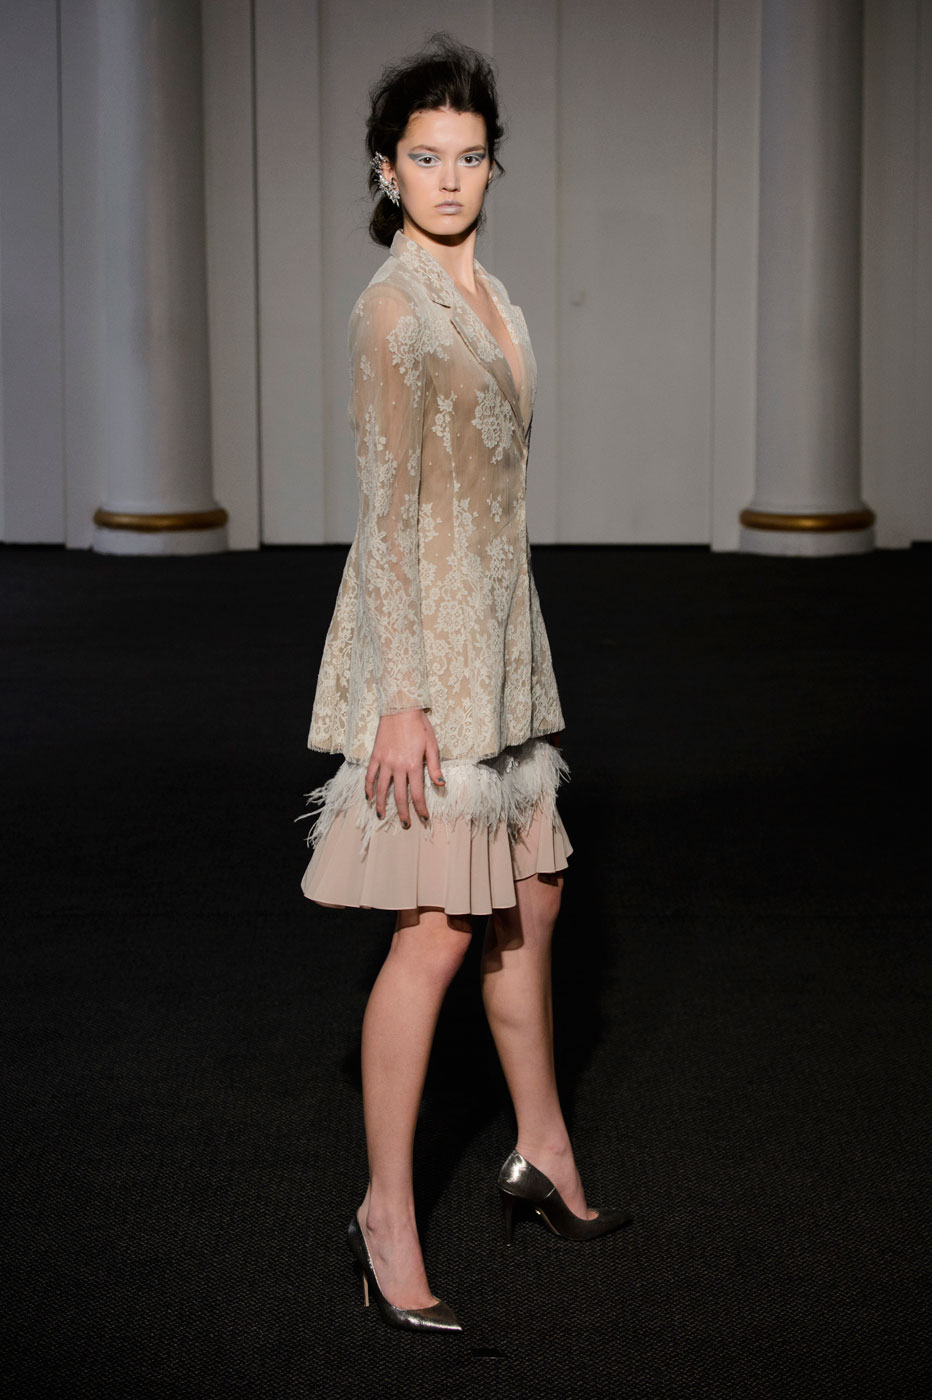 Busardi-fashion-runway-show-haute-couture-paris-spring-2015-the-impression-06